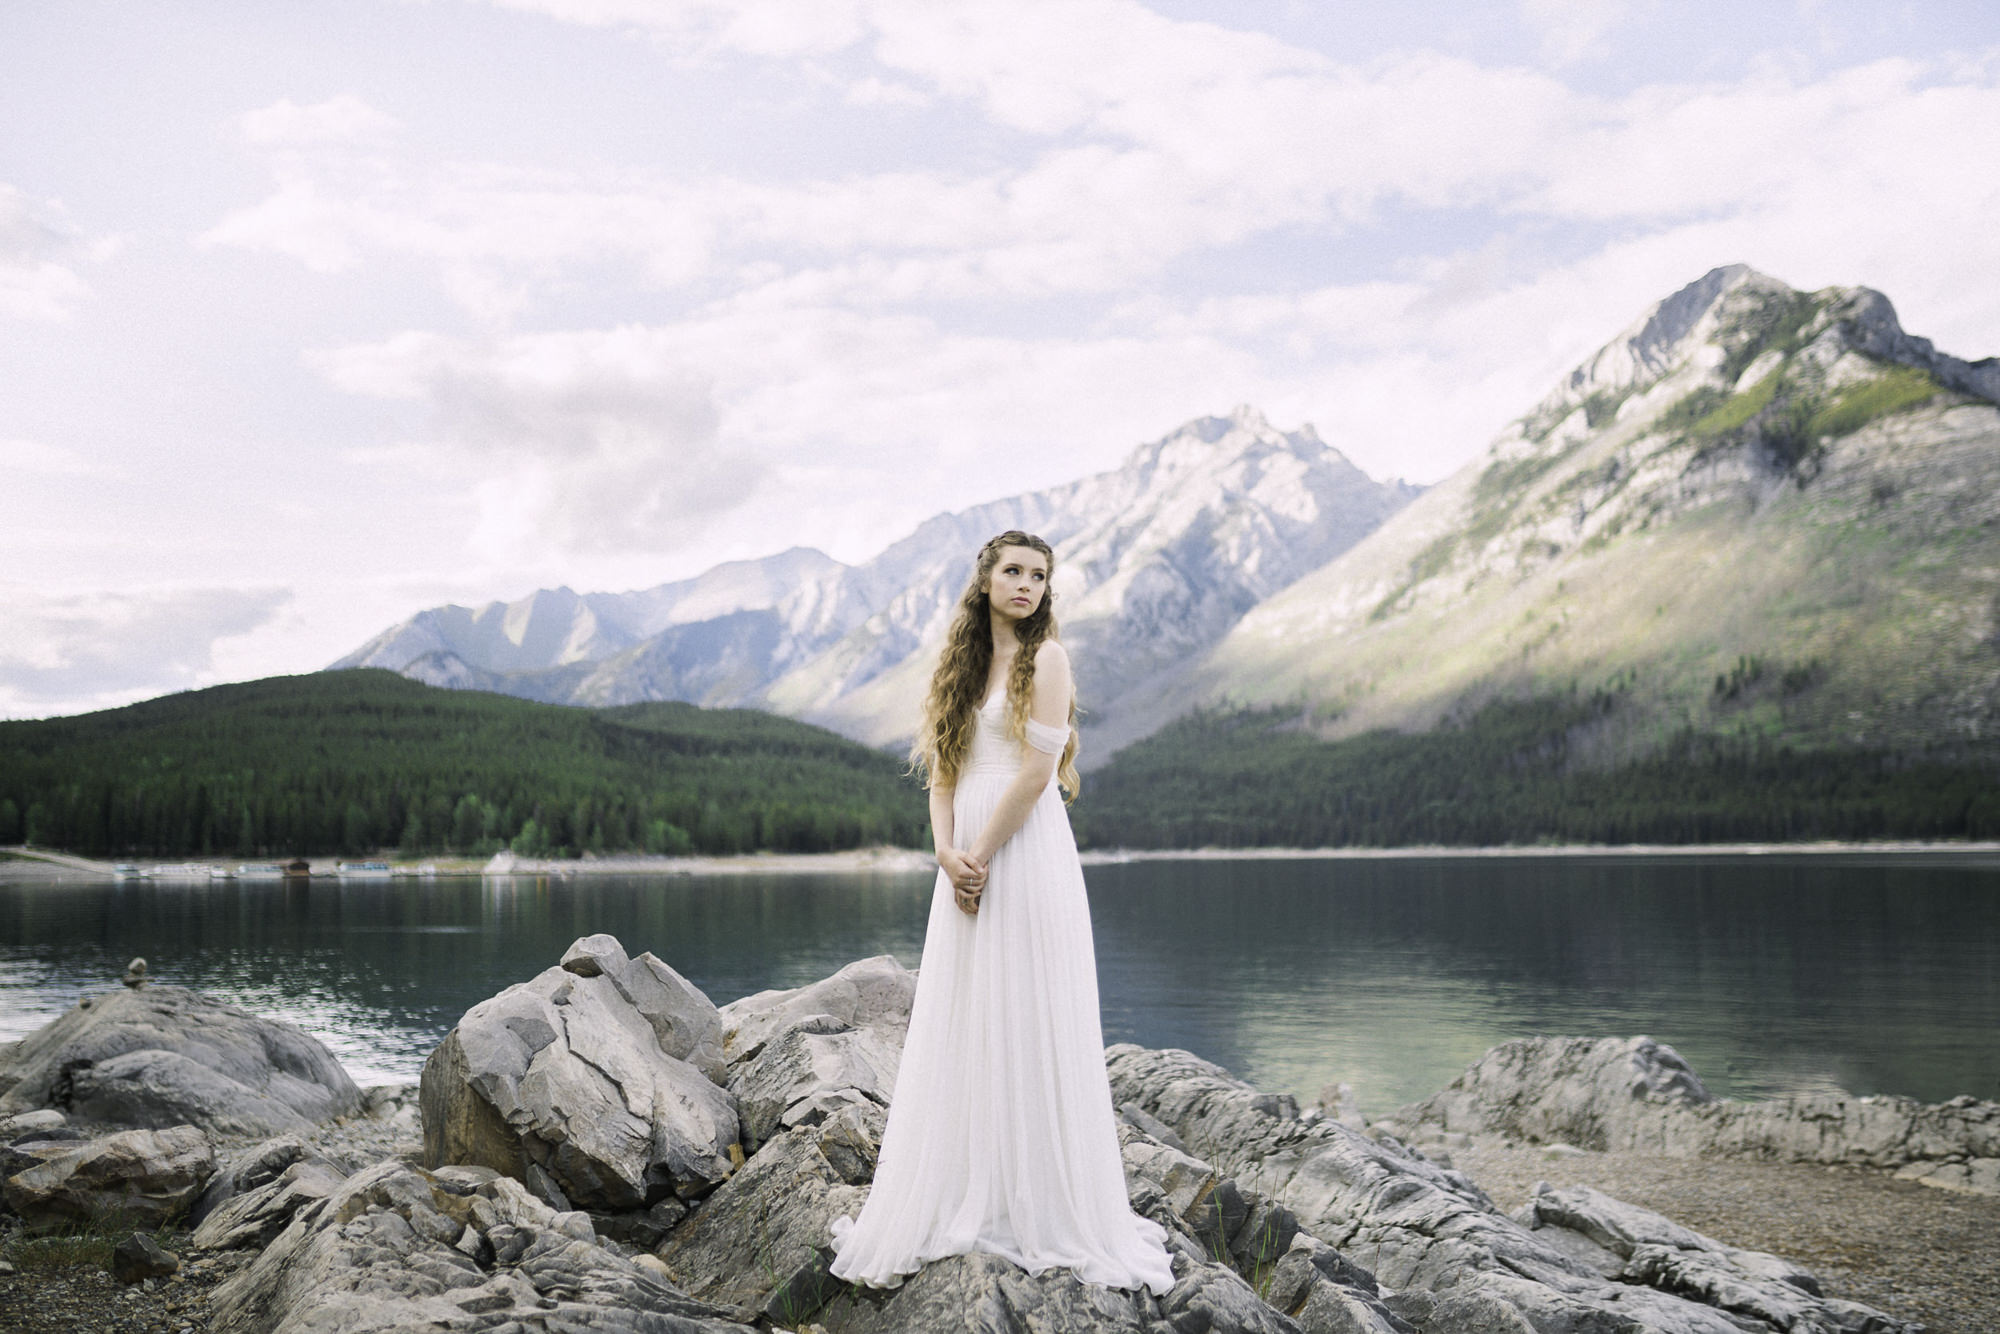 Lake-minnewanka-banff-joyfoley.jpg